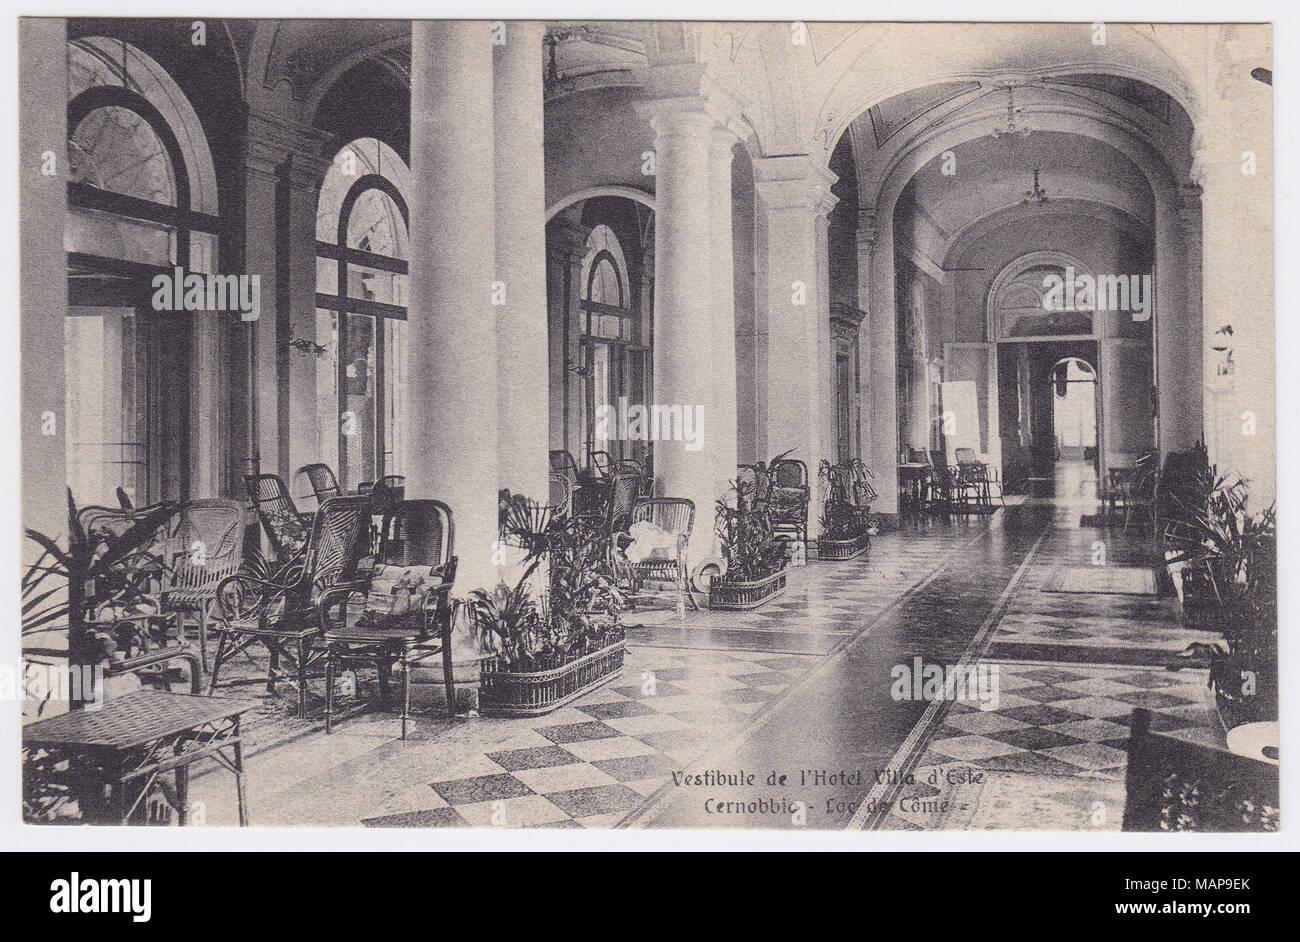 Villa d'Este, Cernobbio, Italy, Hall - Stock Image